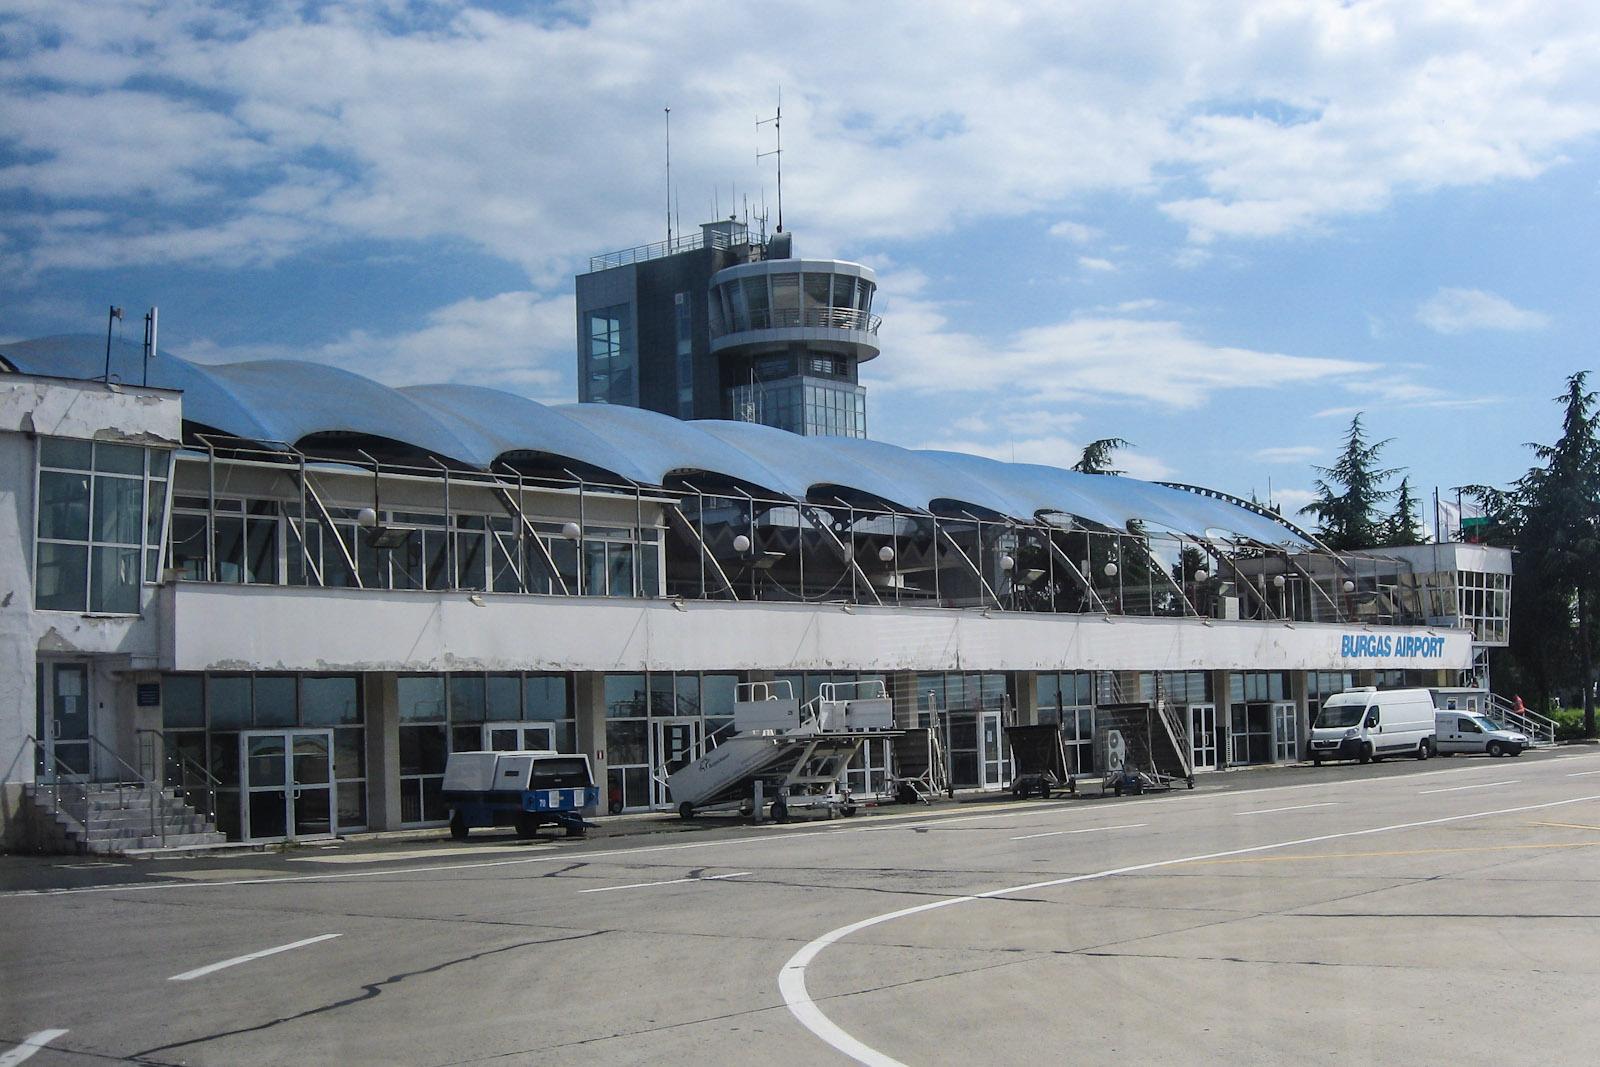 Вид с перрона на старый аэровокзал аэропорта Бургас